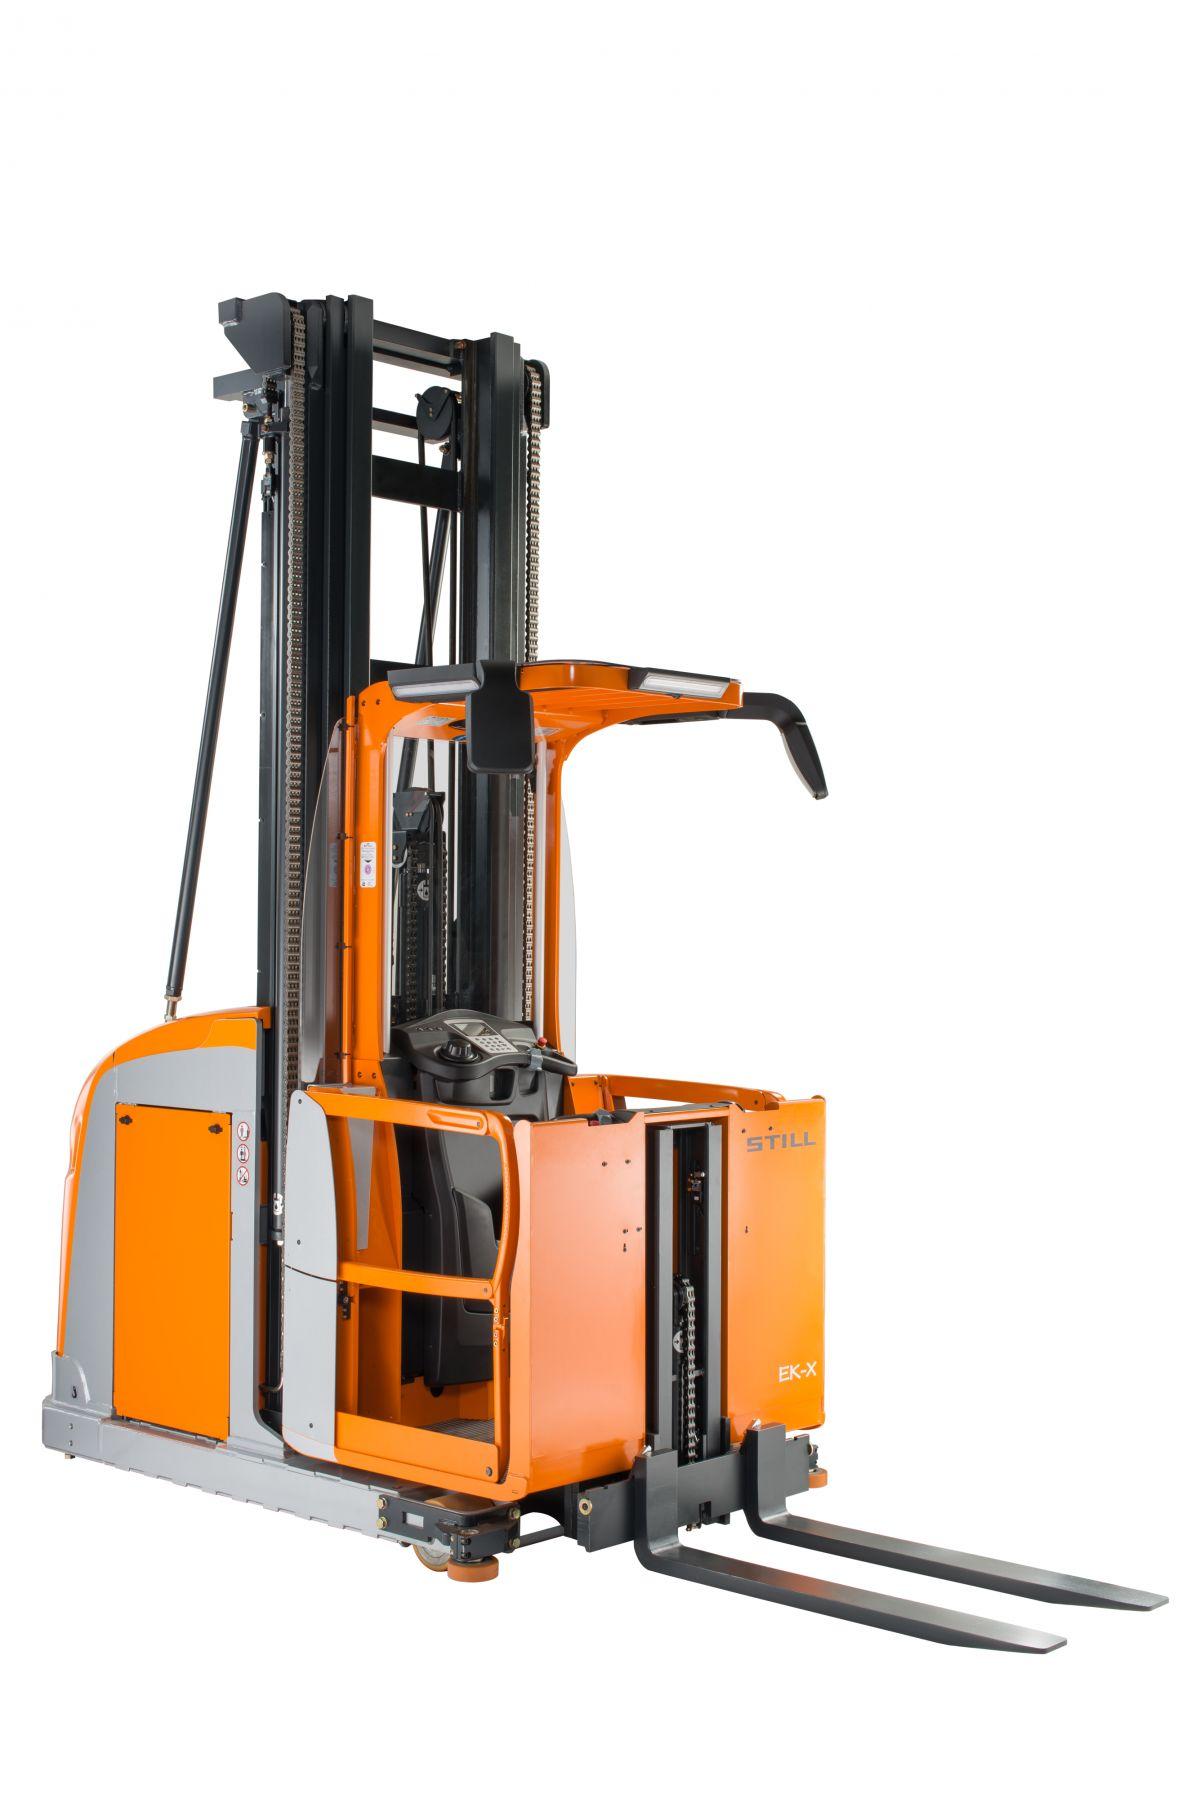 Super Linde H25D Evo | Used Diesel Forklift Trucks | Used Equipment @RT_54